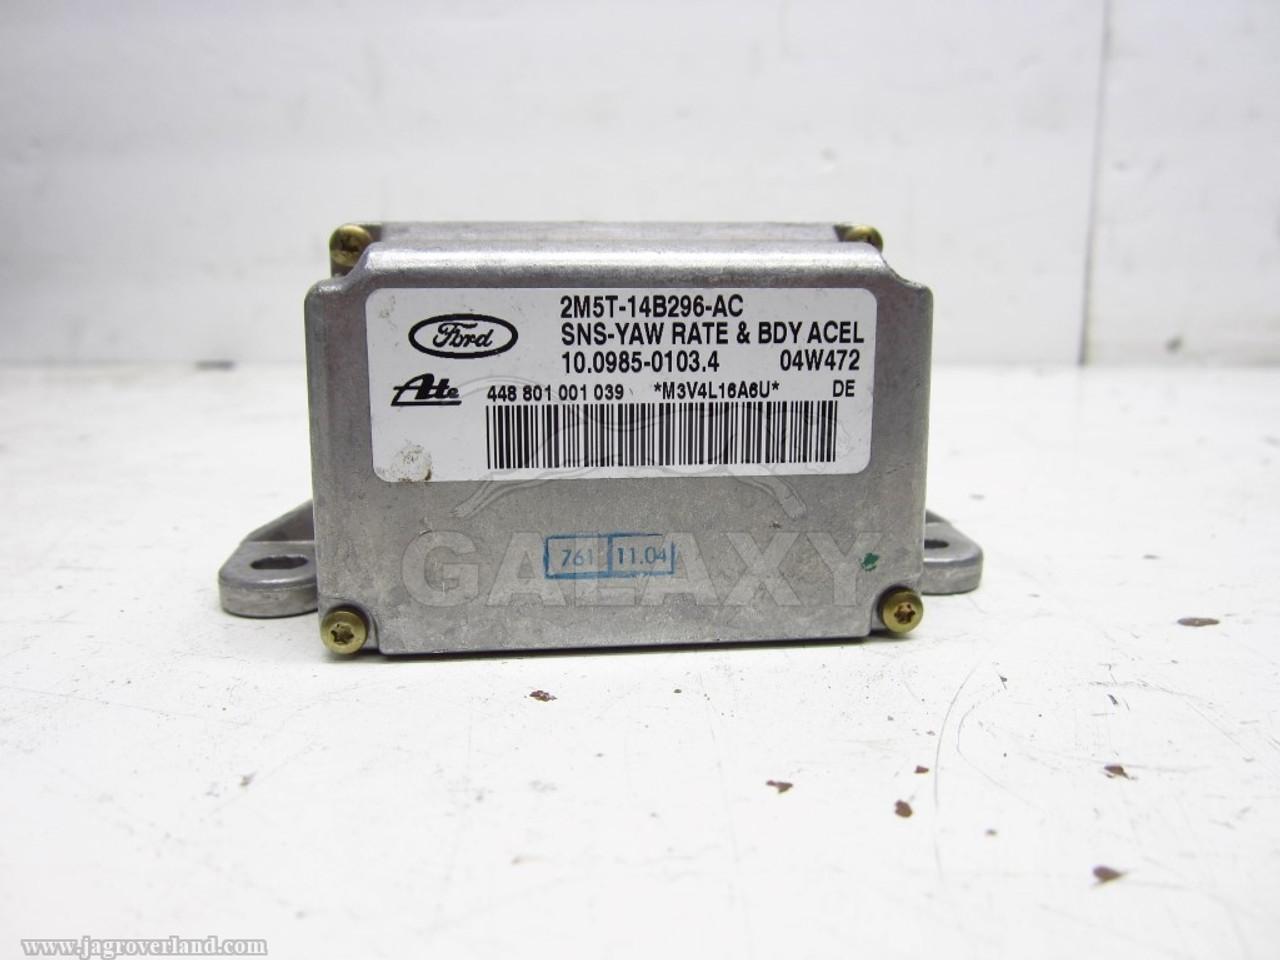 04-07 Xj8 Yaw Rate Sensor 2M5T-14B296-Ac